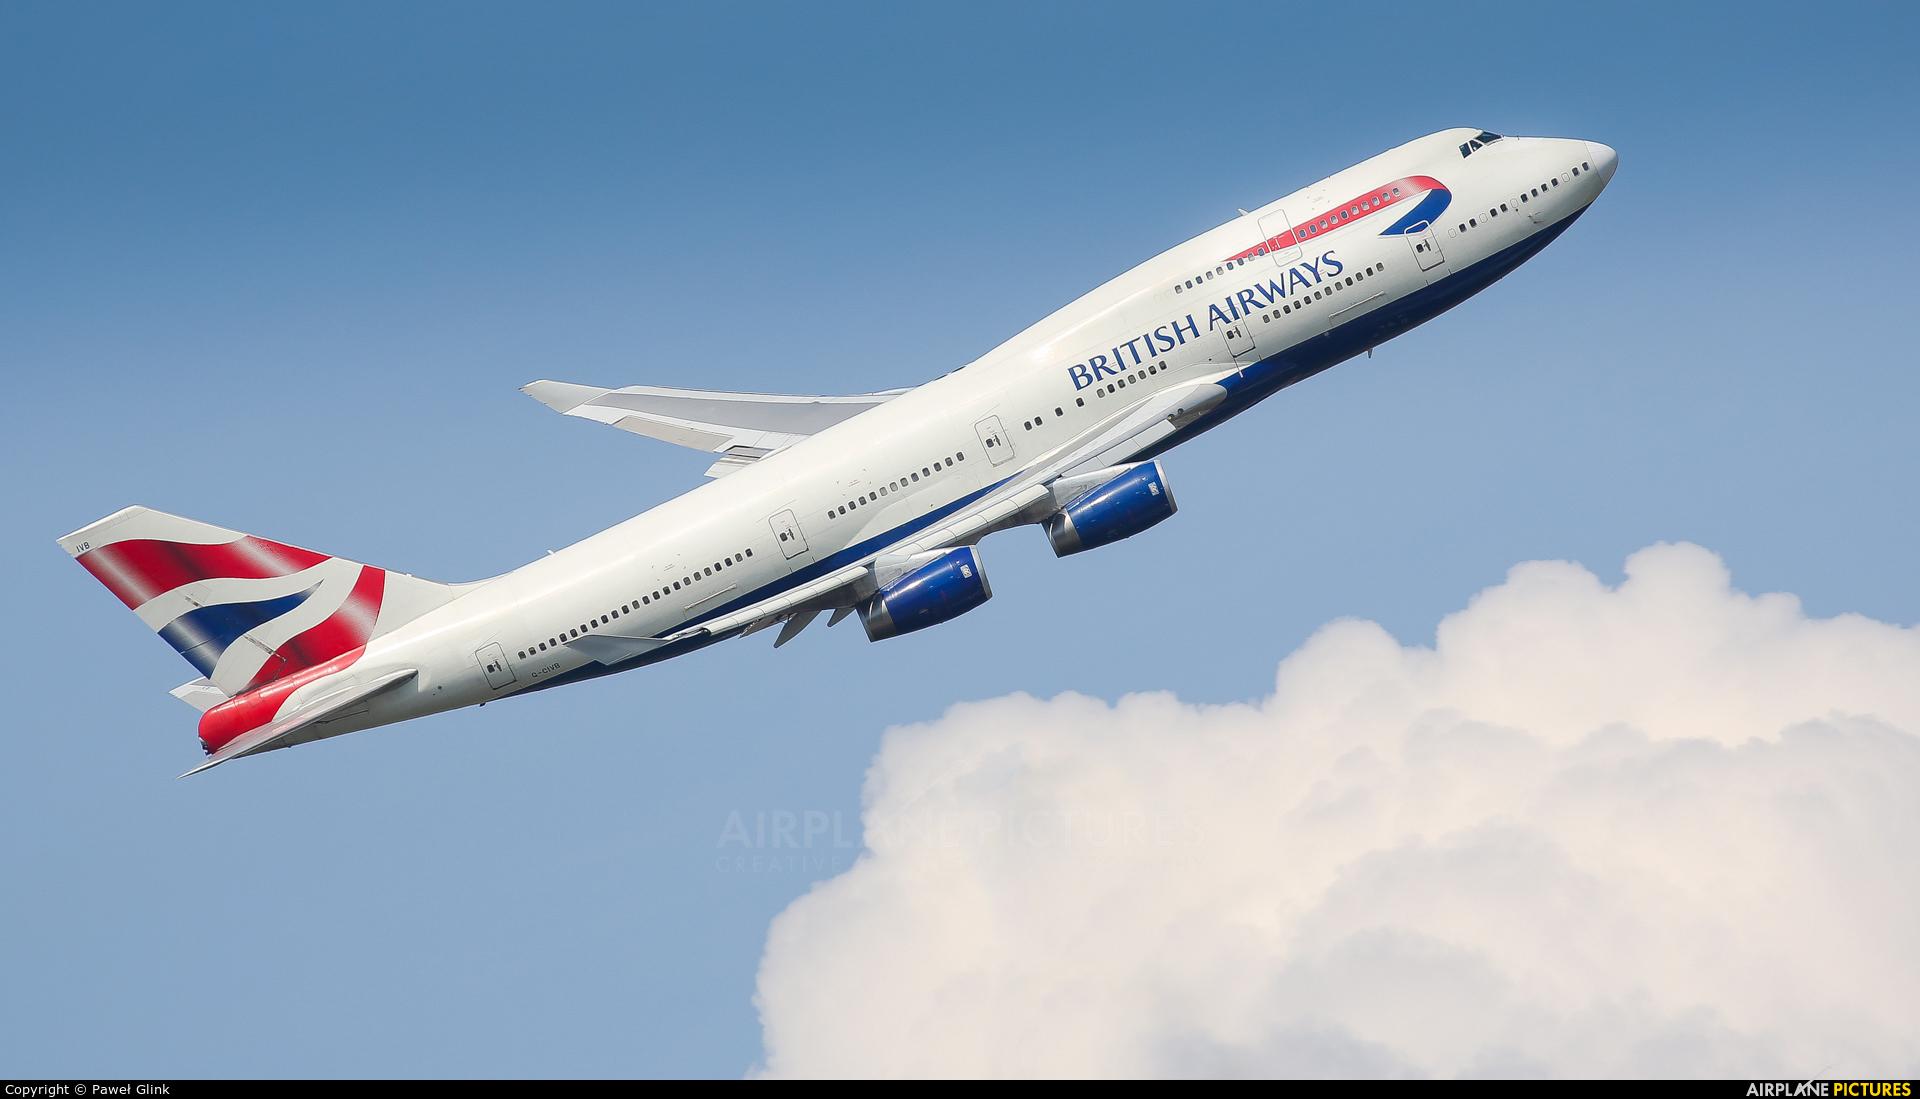 British Airways G-CIVB aircraft at London - Heathrow